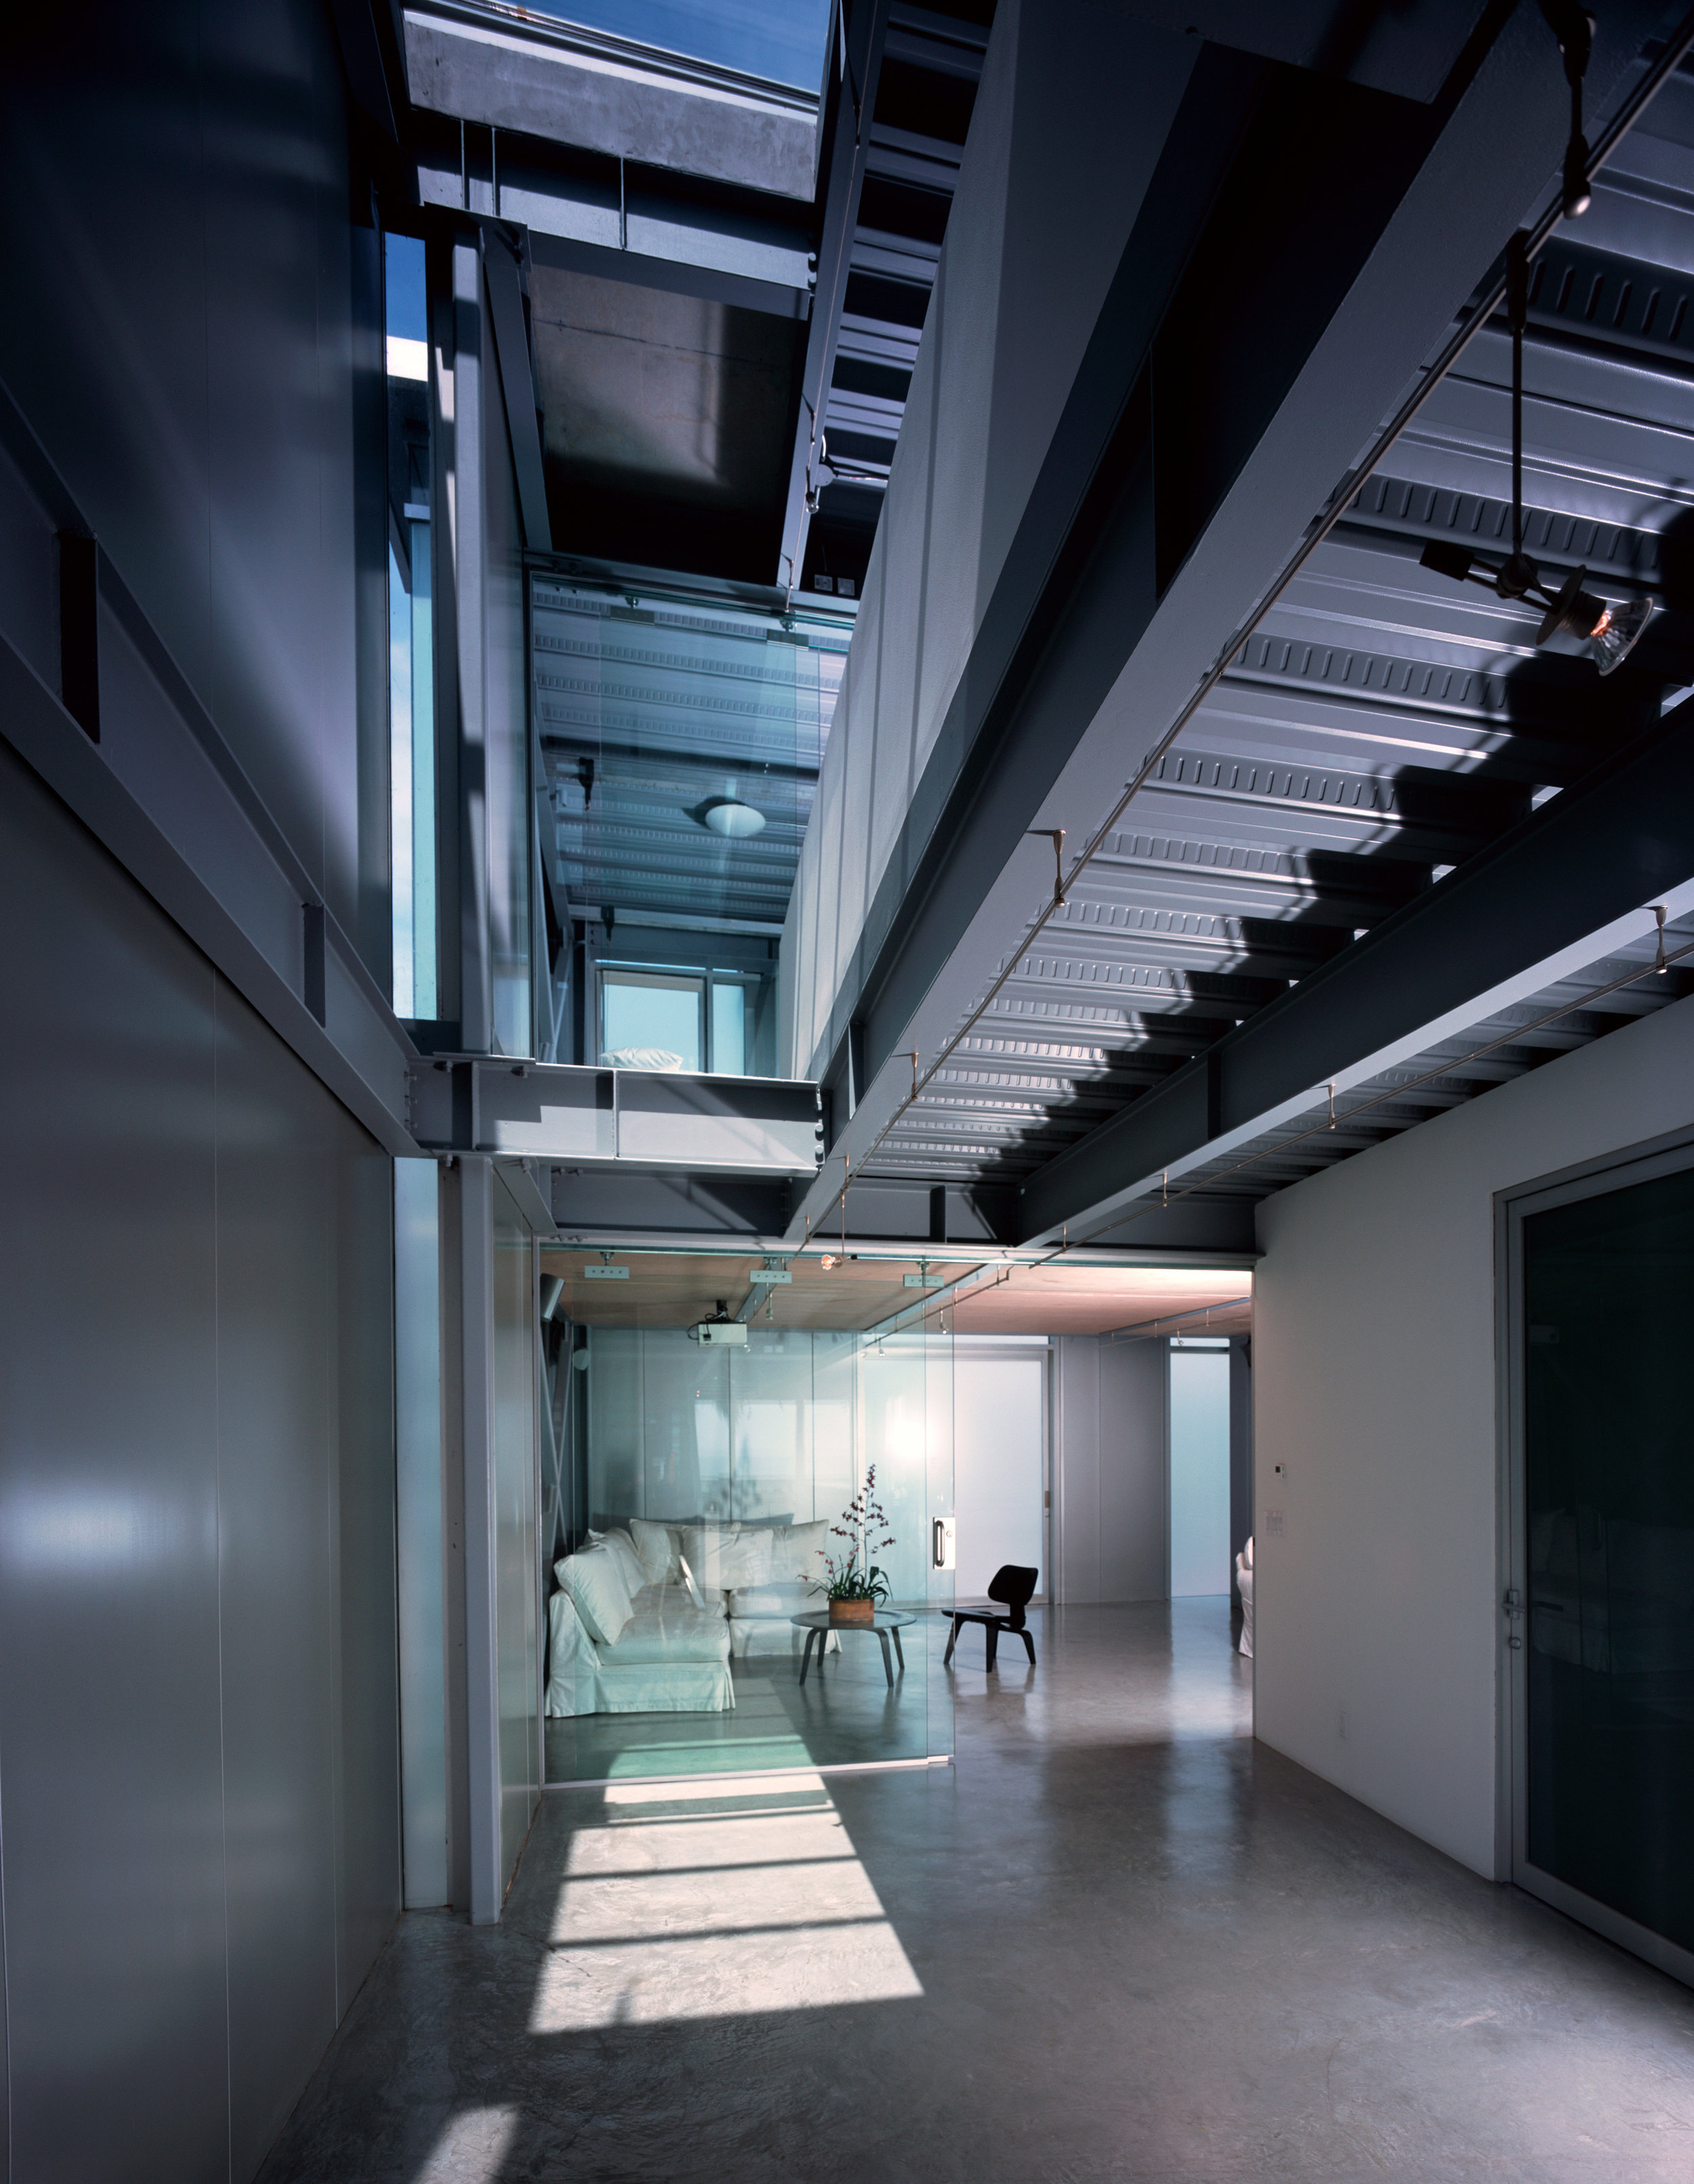 S.E.A.-Studio-Environmental-Architecture-David-Hertz-FAIA-Panel-House-Venice-Beach-California-sustainable-regenerative-restorative-green-design-prefabricated-aluminum-refrigeration-open-concept-ocean-view-residential-glass-steel-sunset-interior-5.jpg